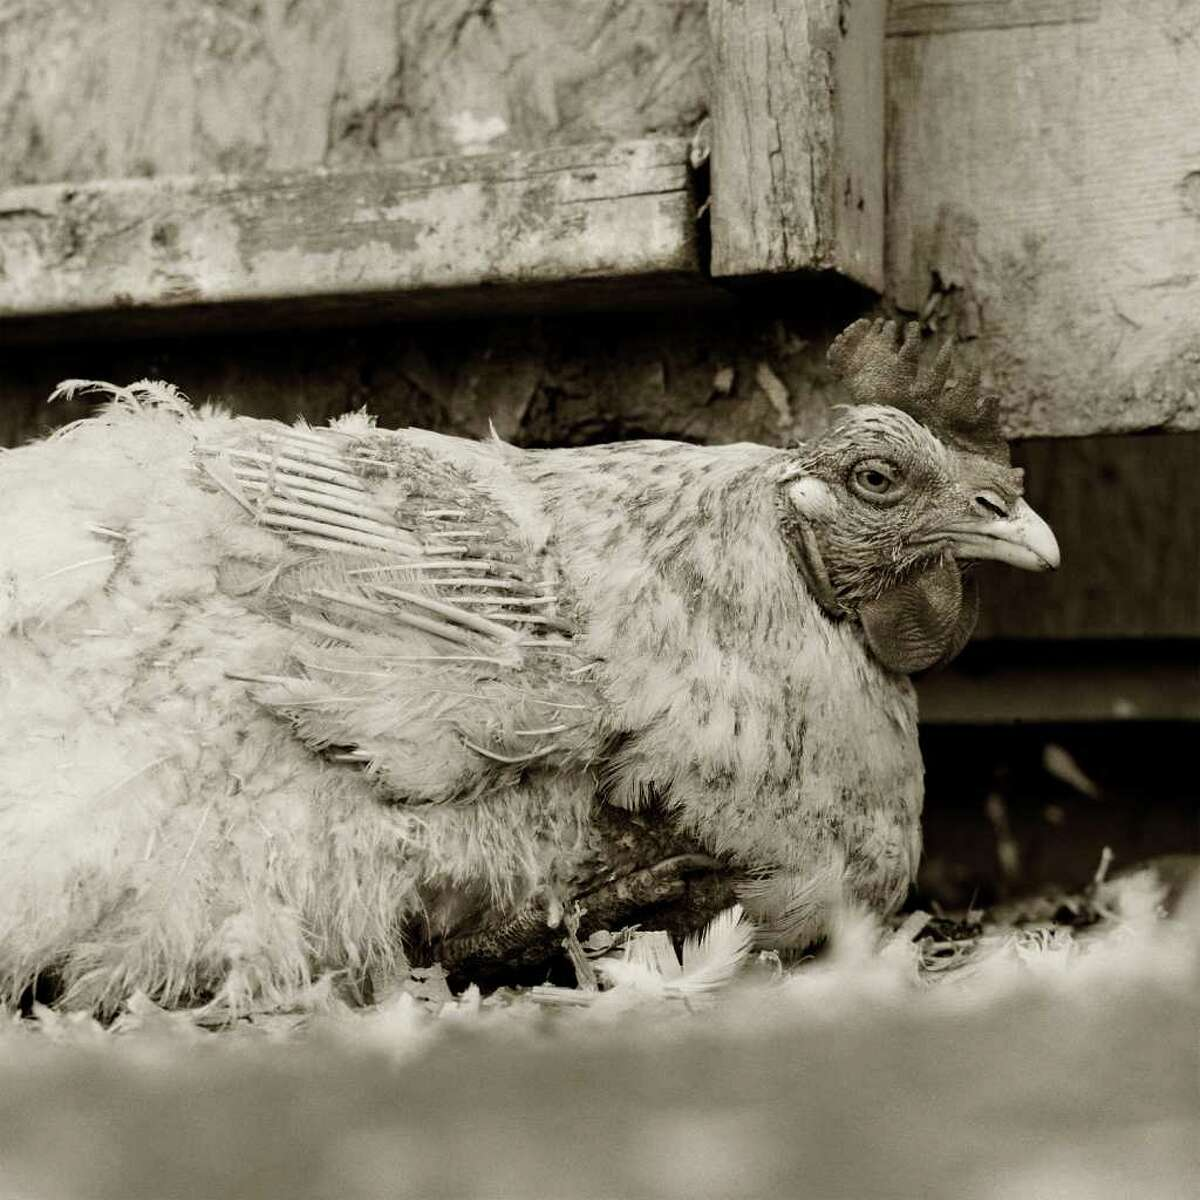 A rooster is among Leshko's subjects. (elderlyanimals.com)